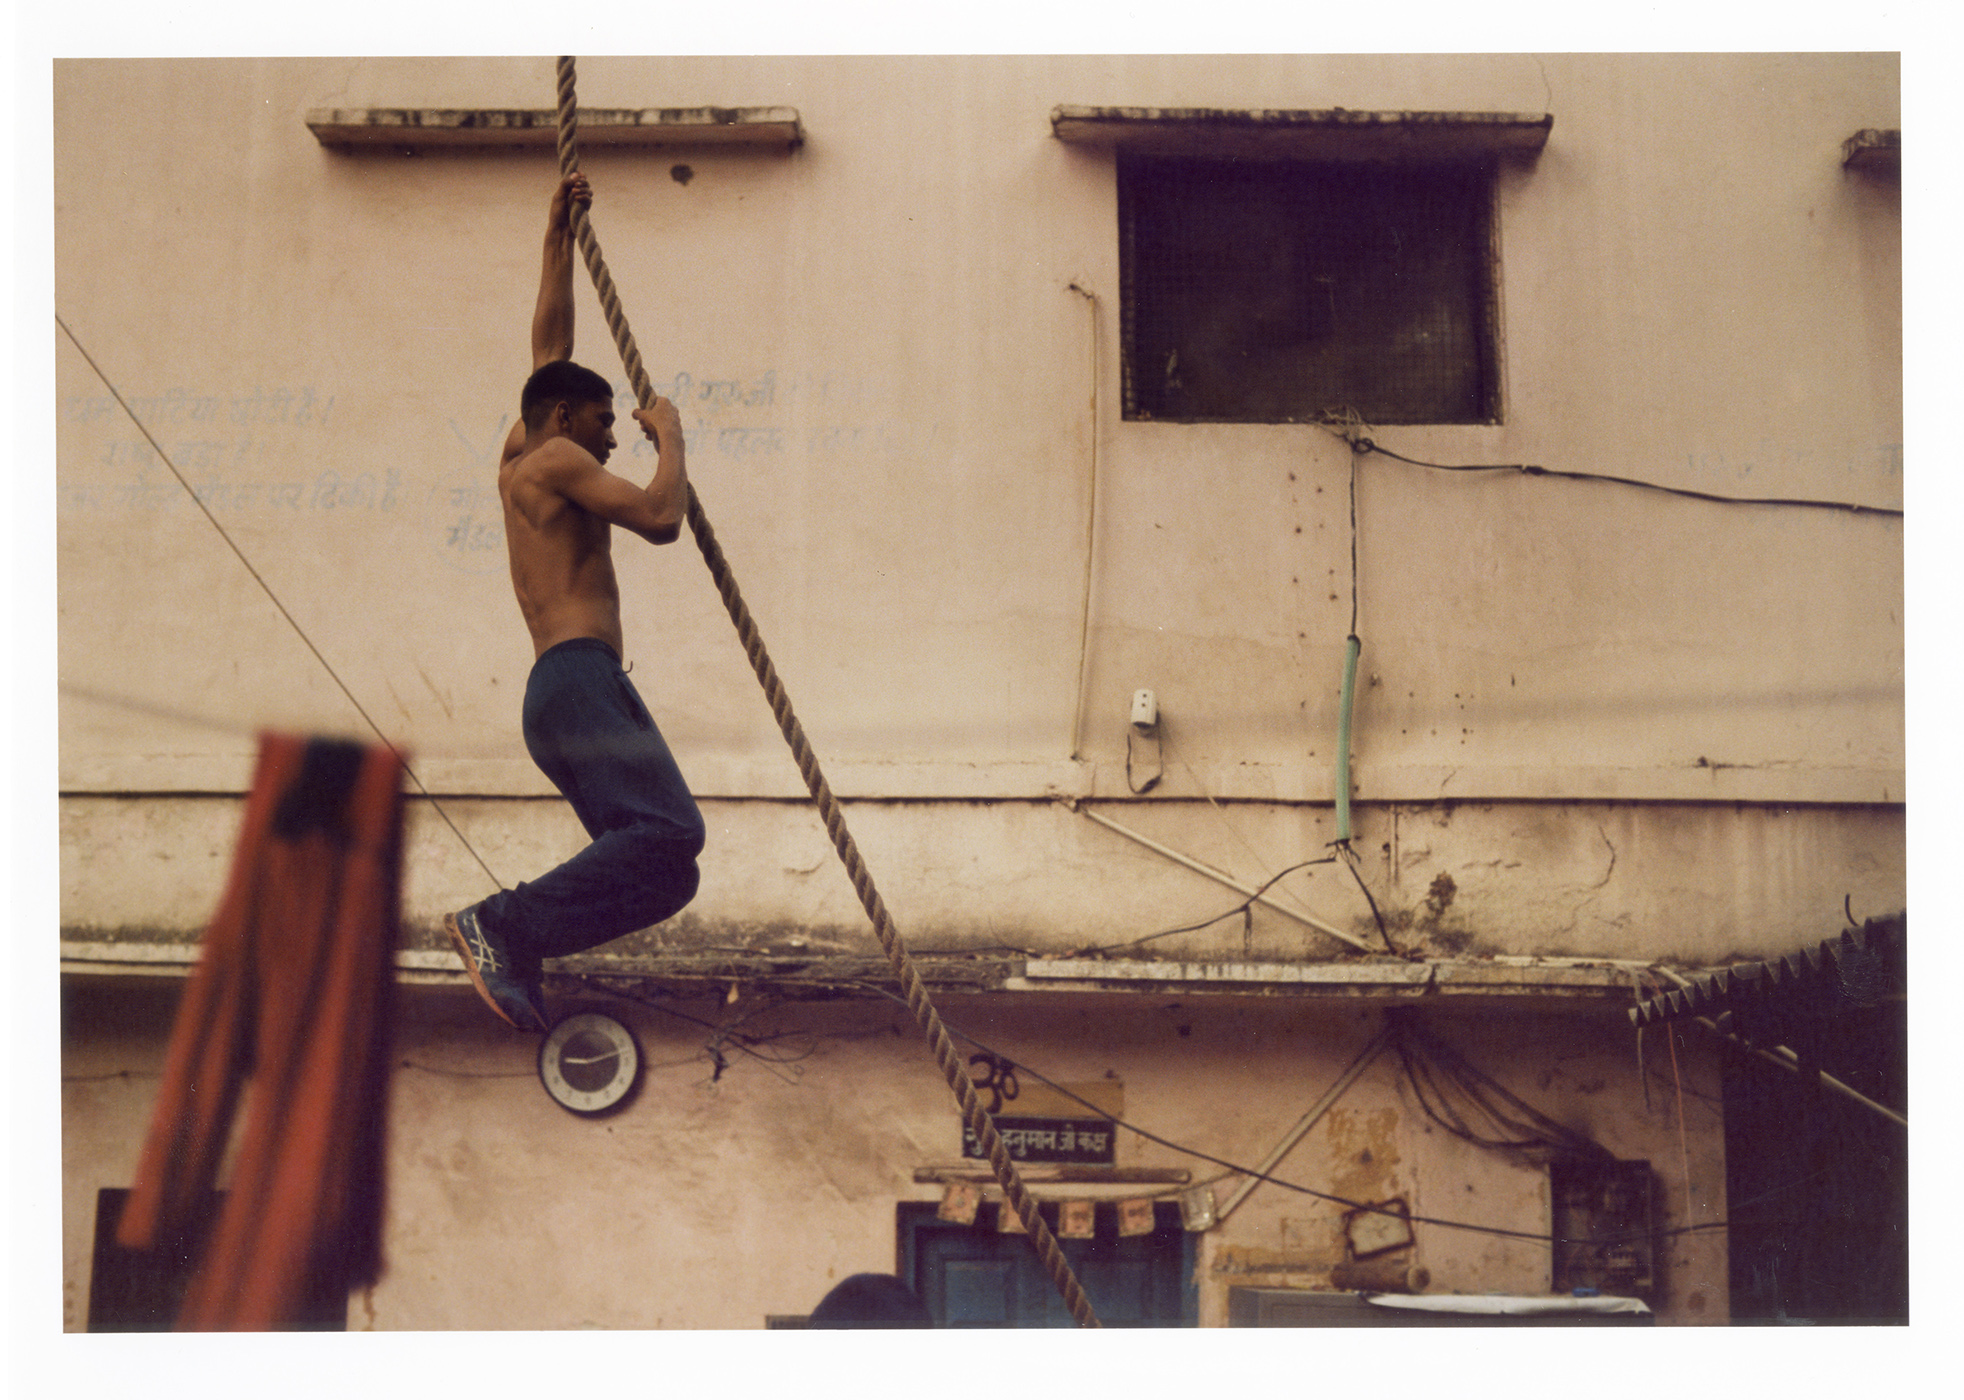 India HanumanRope_009c_1_1.jpg